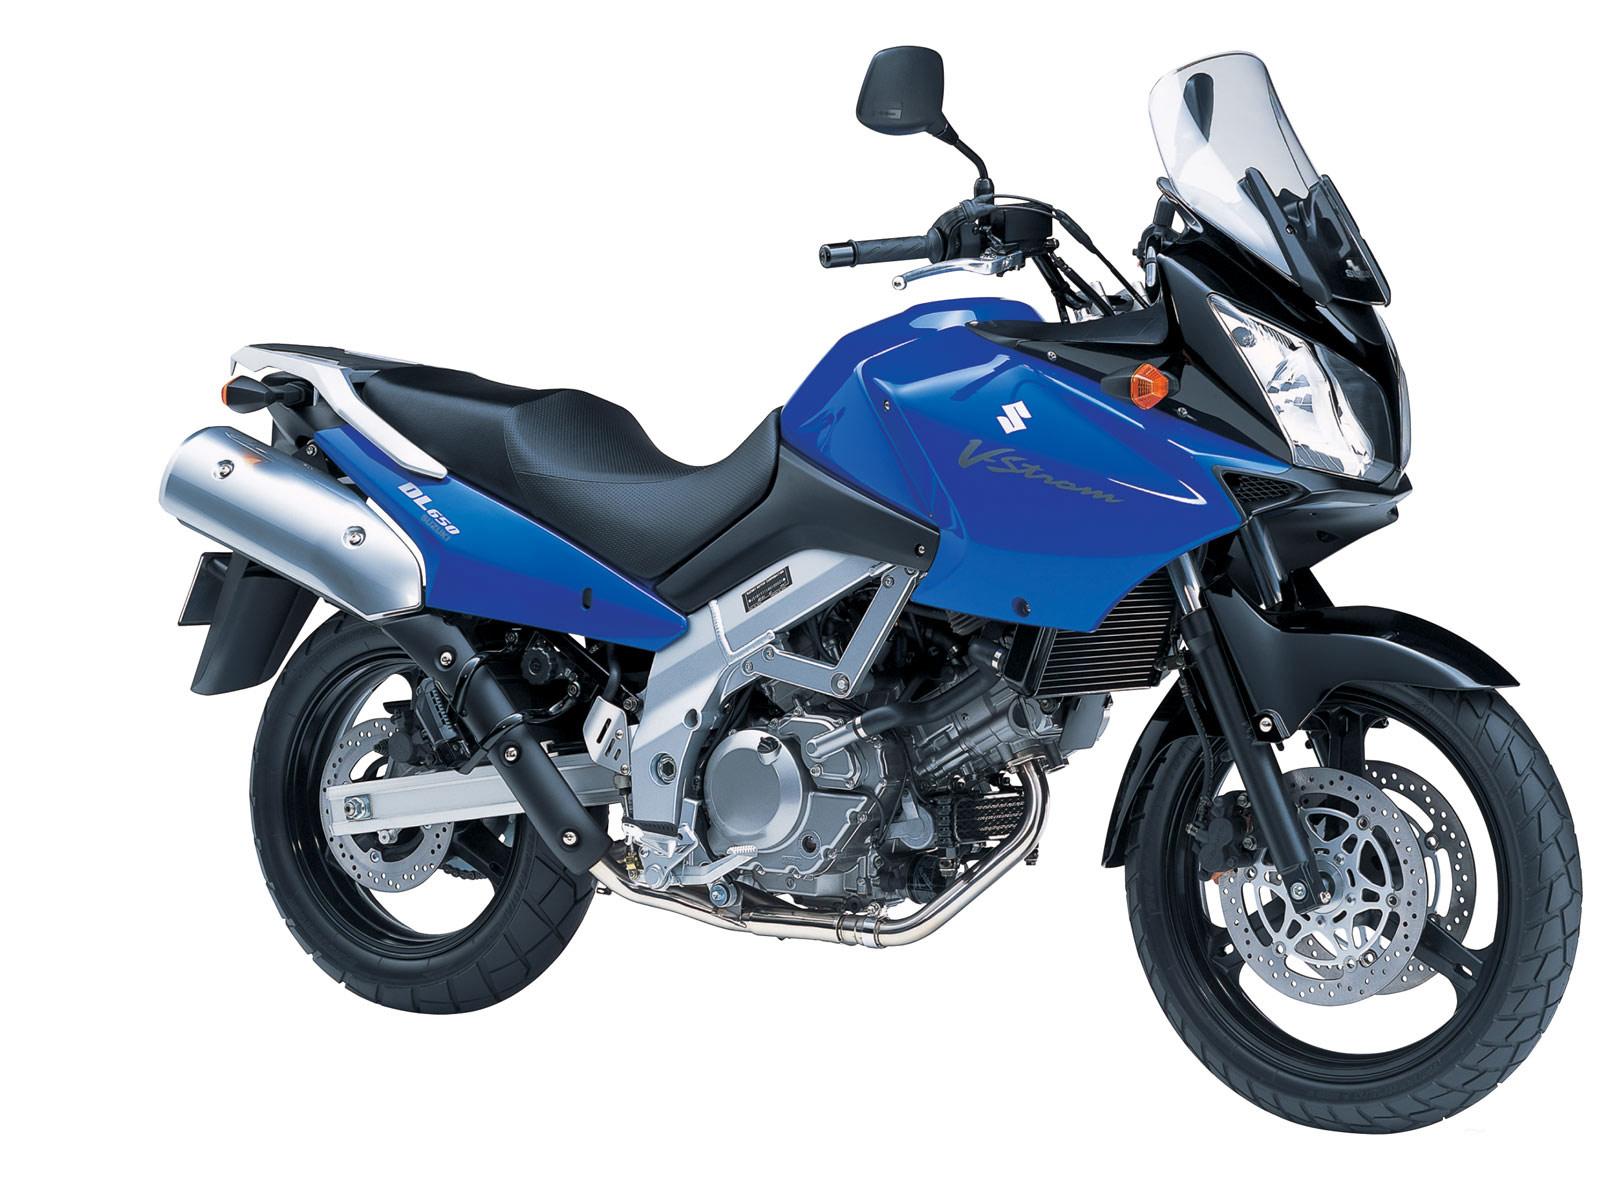 http://3.bp.blogspot.com/-vppfewEBVxw/TkhLmSB602I/AAAAAAAAAfM/JVZKcFFZO7o/s1600/Suzuki-DL-650_V-Strom_2004_motorcycle-desktop-wallpaper_05.jpg